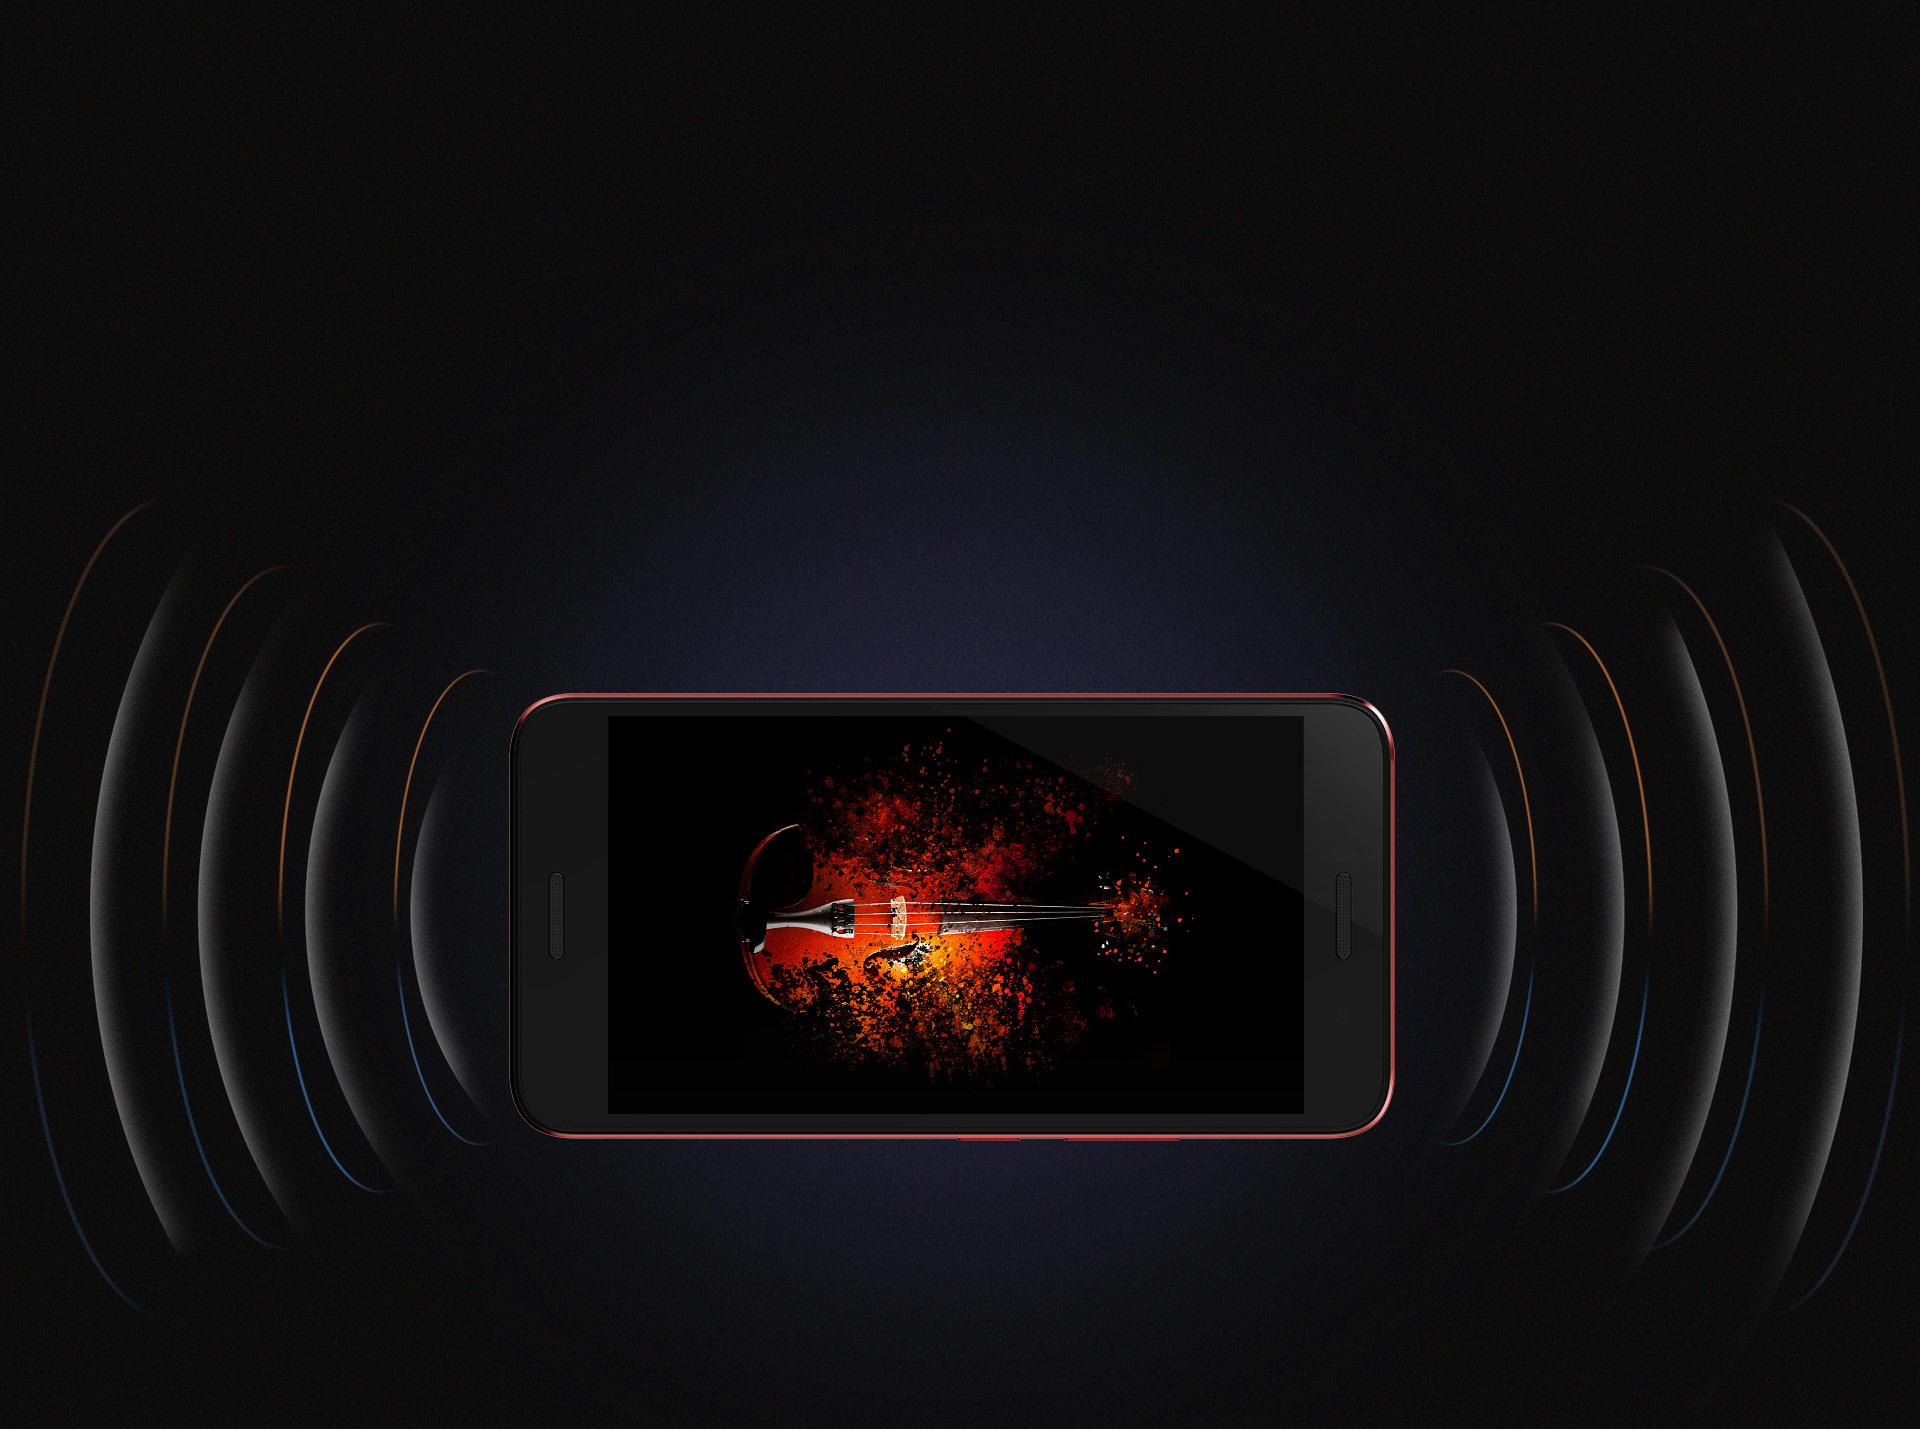 http://www.infinixmobility.com/fileadmin/infinix/source/images/hot5/en/stereo-3d.jpg